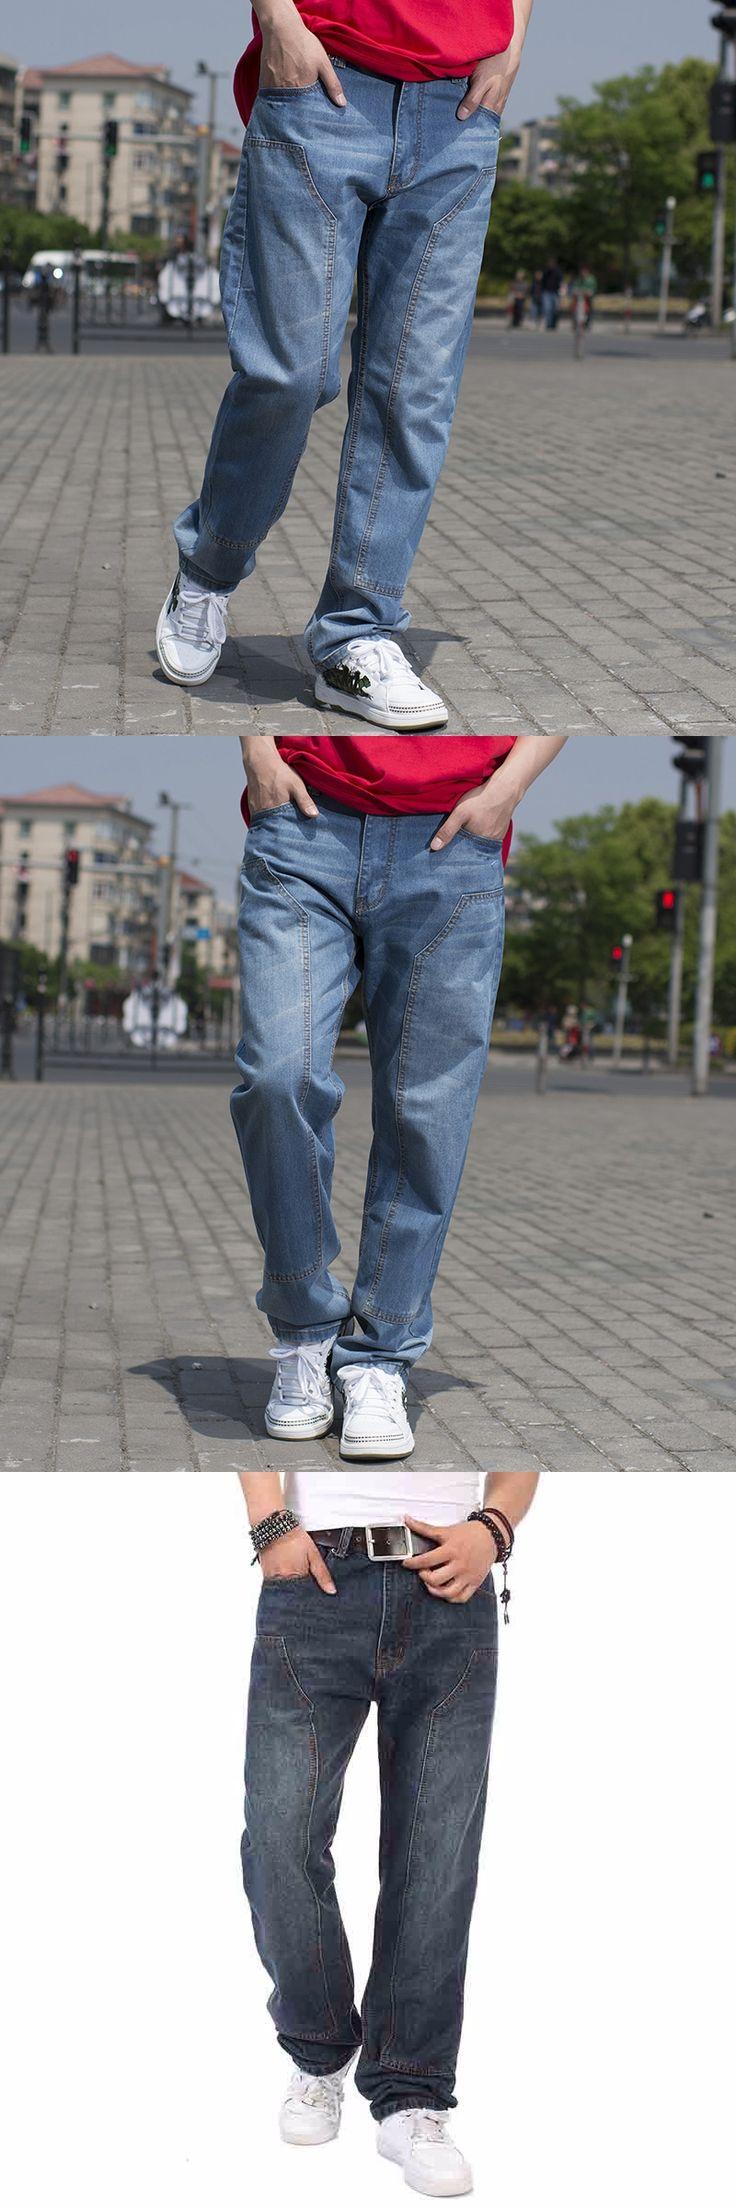 Loose fit Men's Baggy Hip Hop Jeans 2017 Plus Size 30-46 Multi Pockets Skateboard Cargo Jeans For Men Tactical Denim Joggers